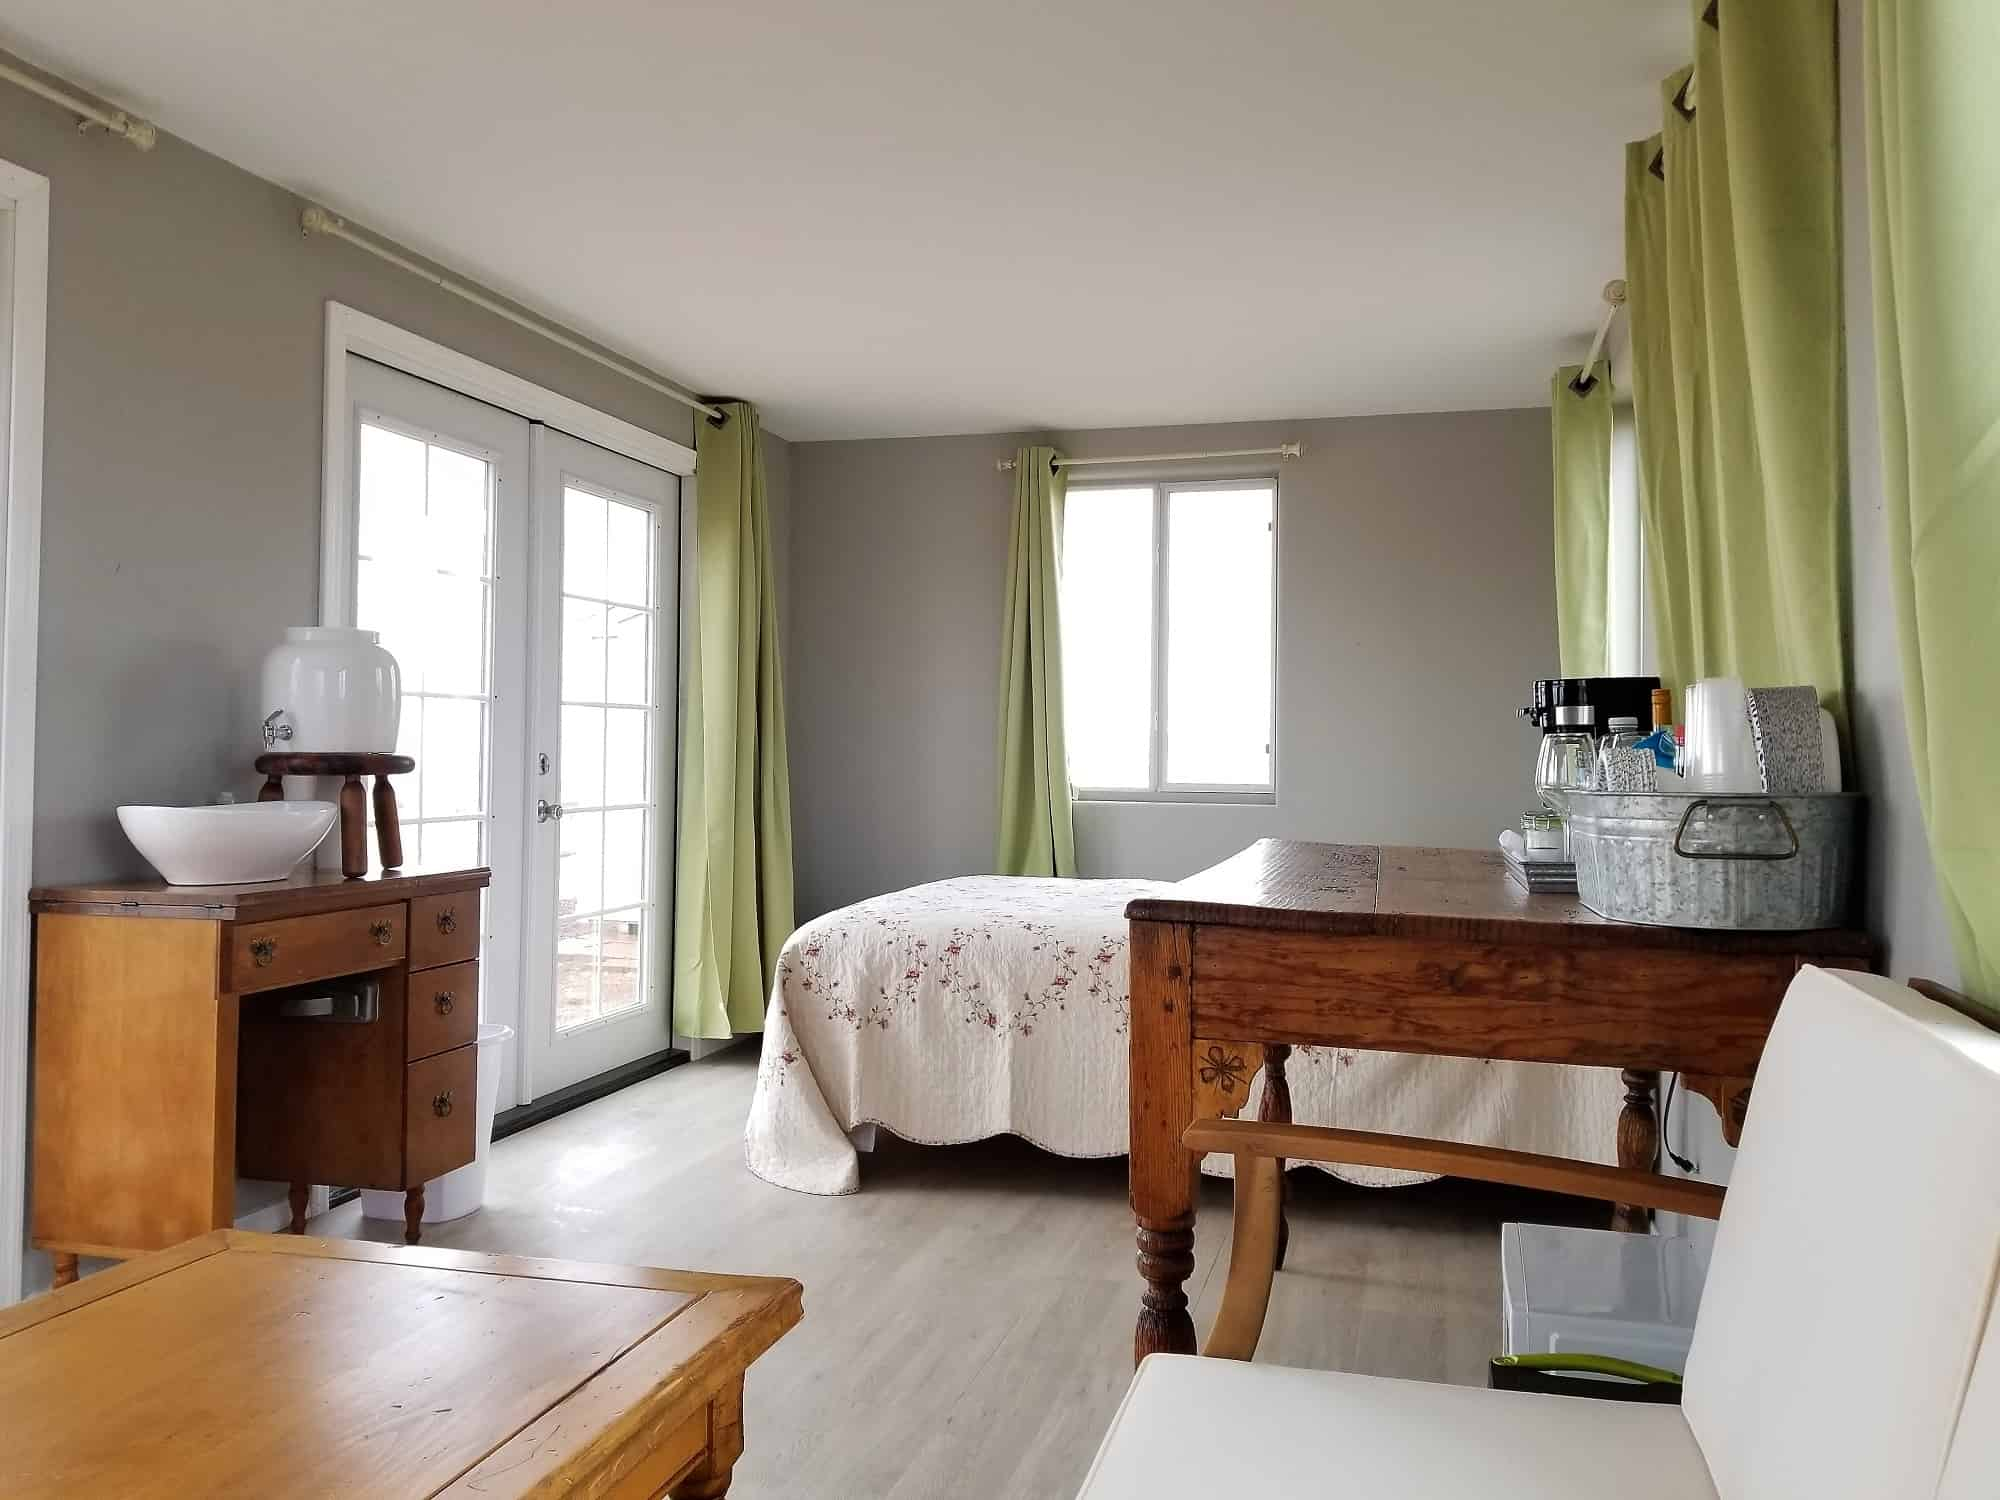 Sonoita Cottage interior